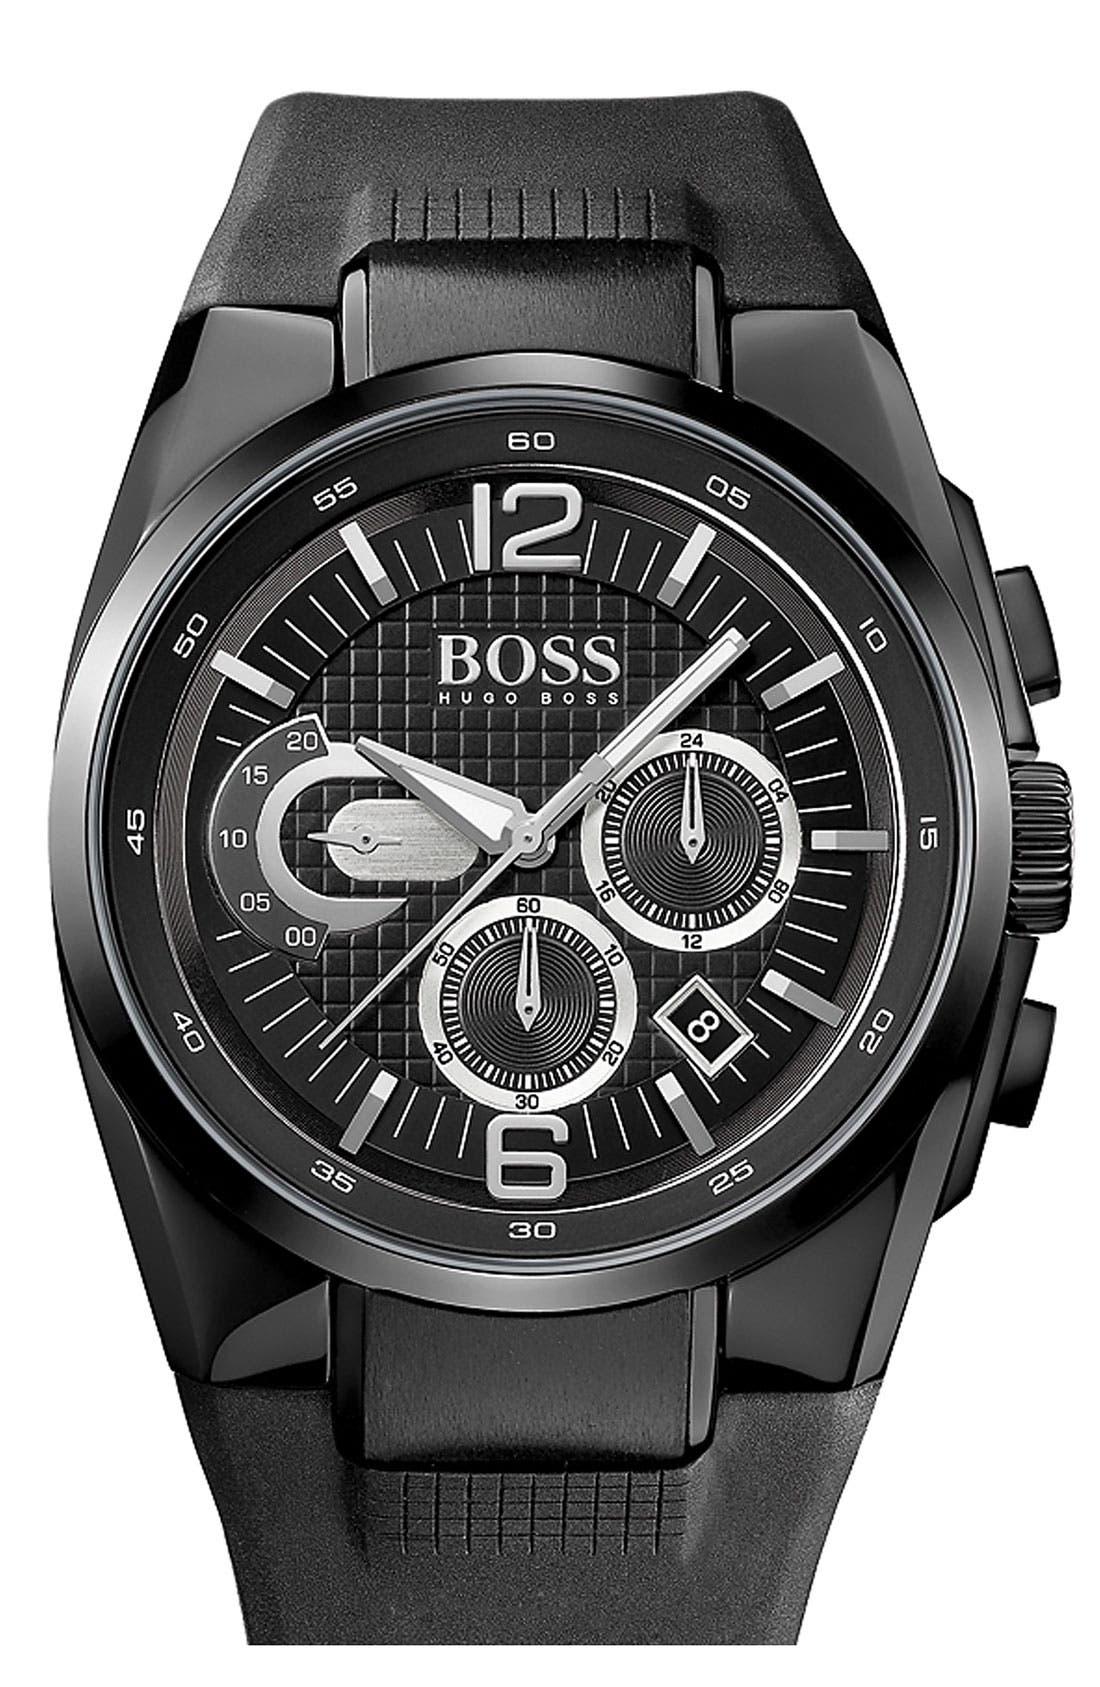 Alternate Image 1 Selected - BOSS HUGO BOSS 'HB2005' Chronograph Rubber Strap Watch, 44mm